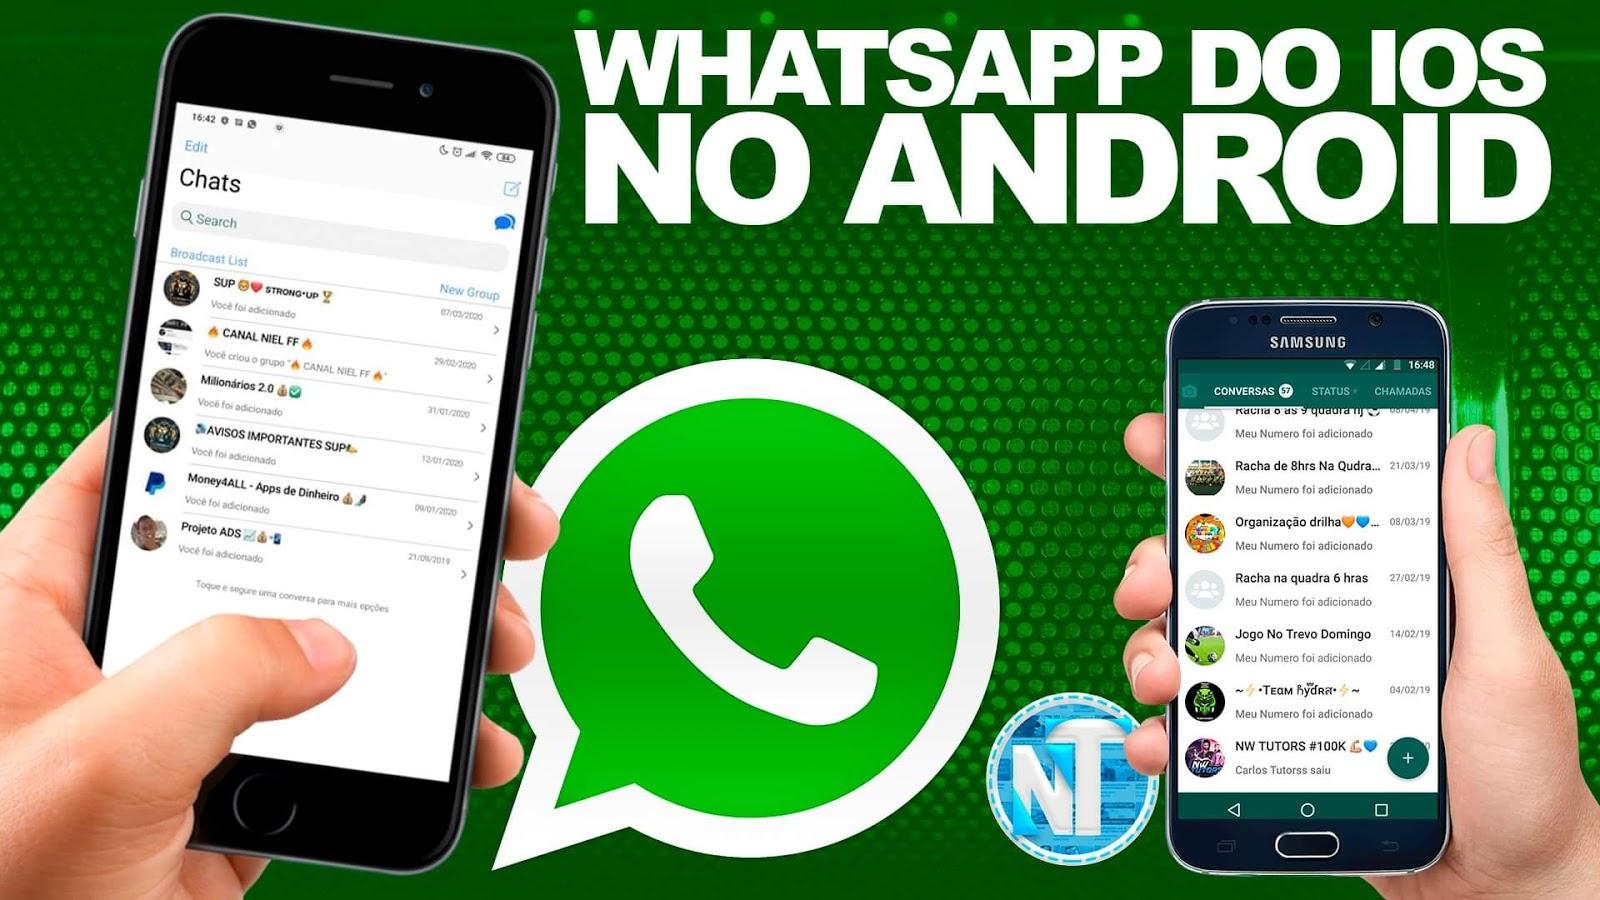 Ficou lindo!! Como Deixar o Whatsapp igual do IPHONE X